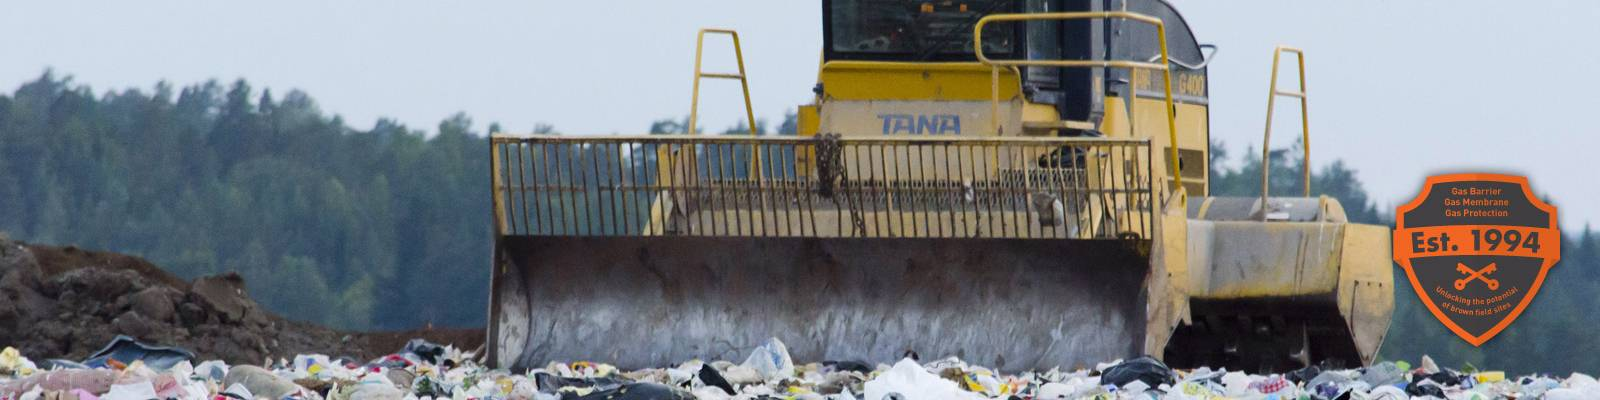 landfill-earthmover-rubbish.jpg